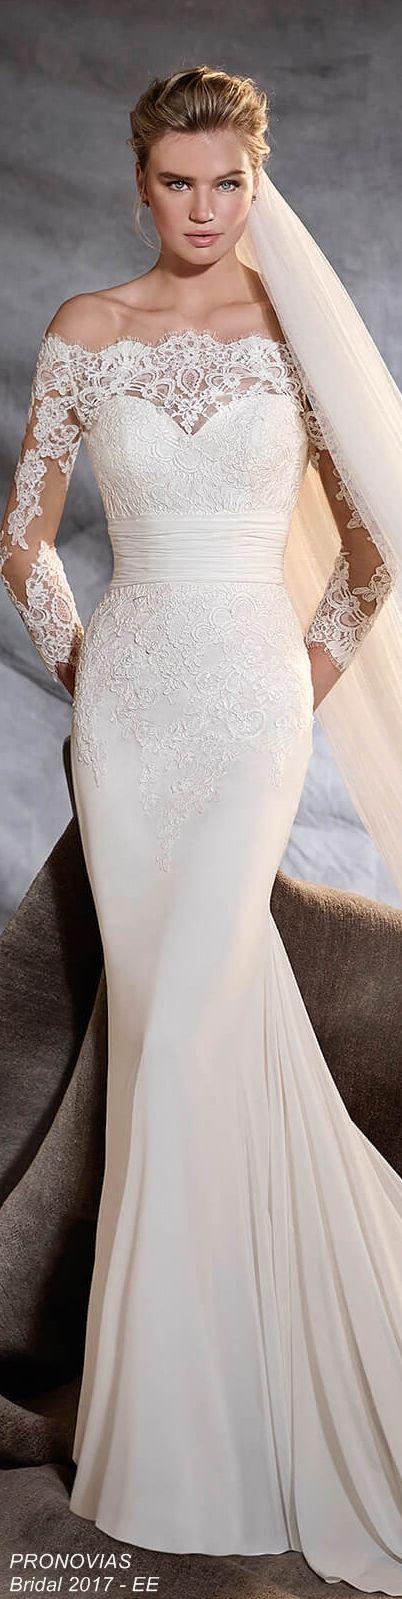 Fashionable Wedding Gowns 2017 : Best 20 pronovias wedding dress ideas on pinterest